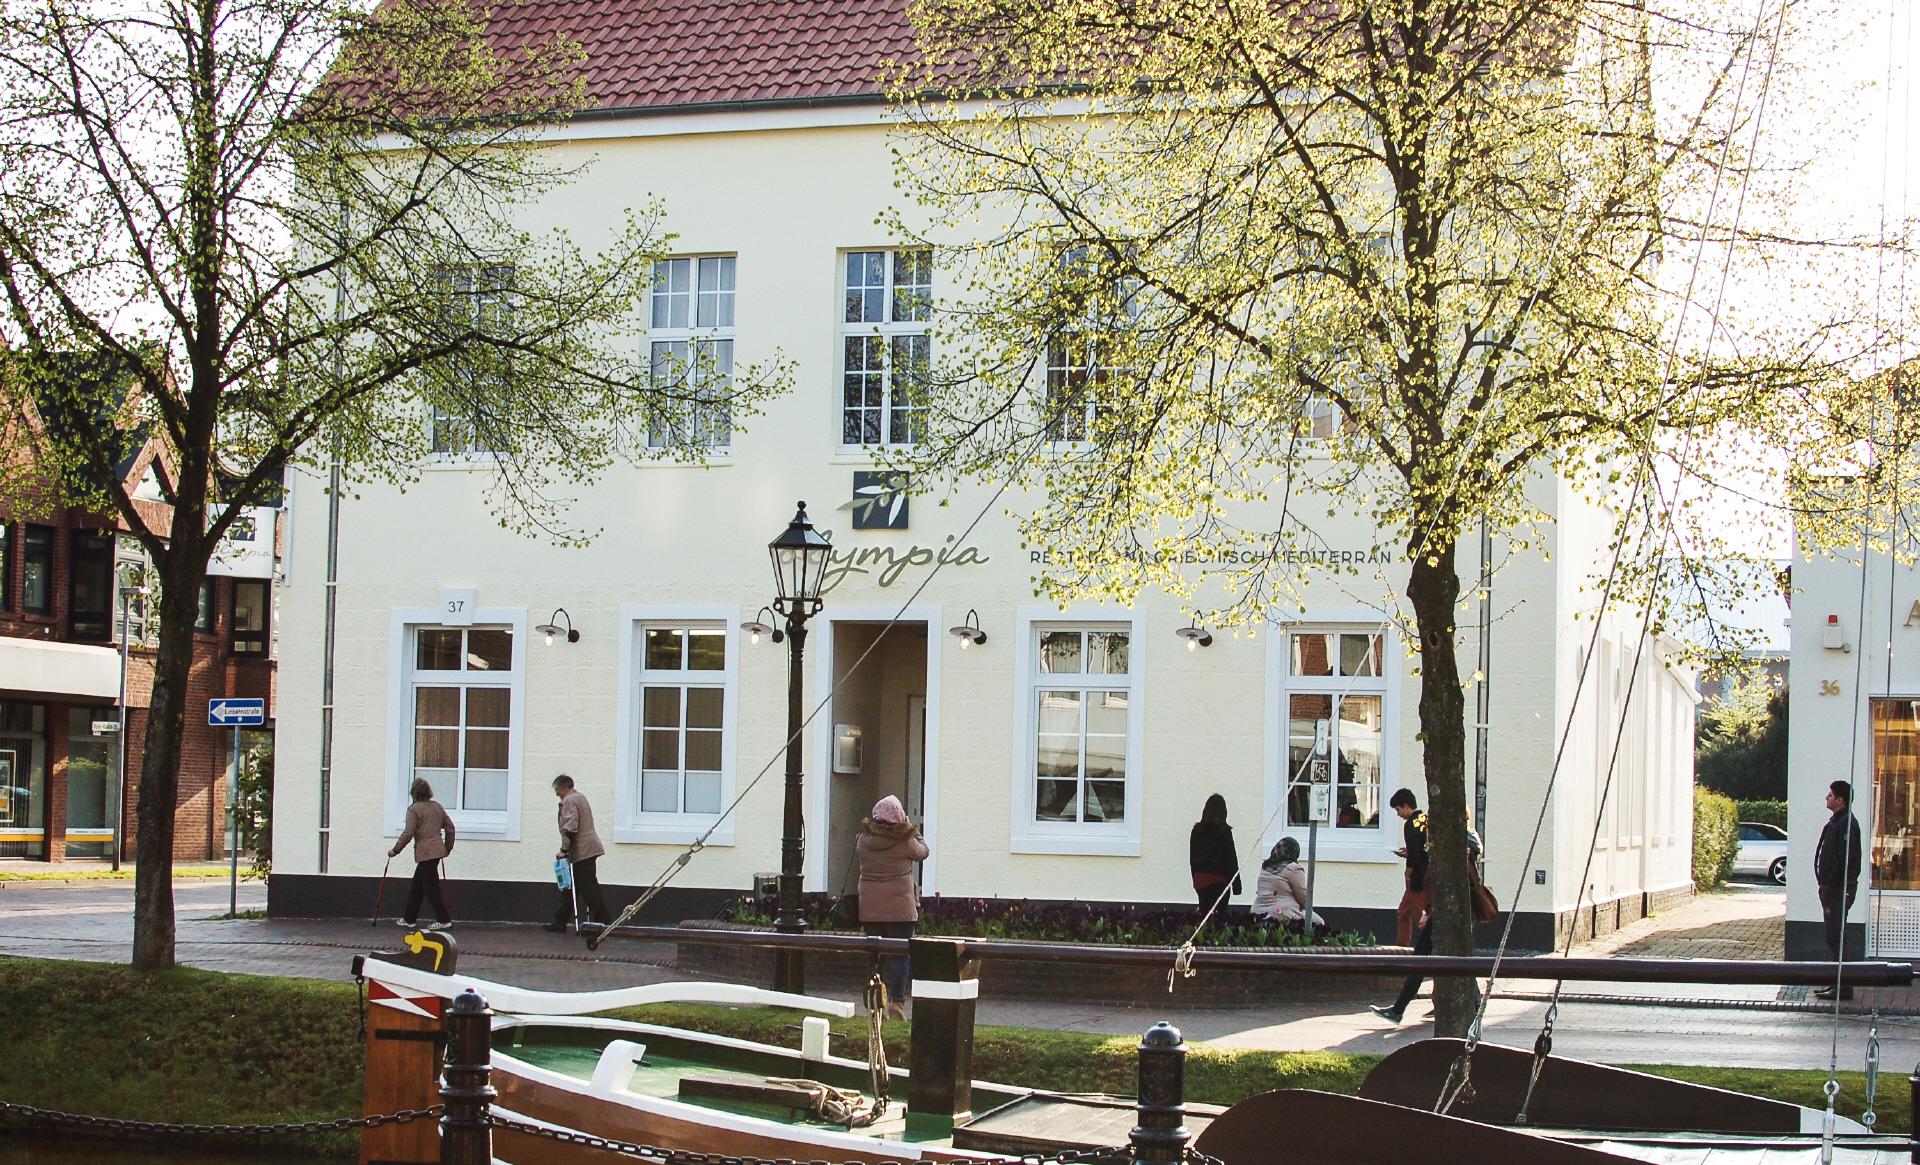 Restaurant Olympia Papenburg